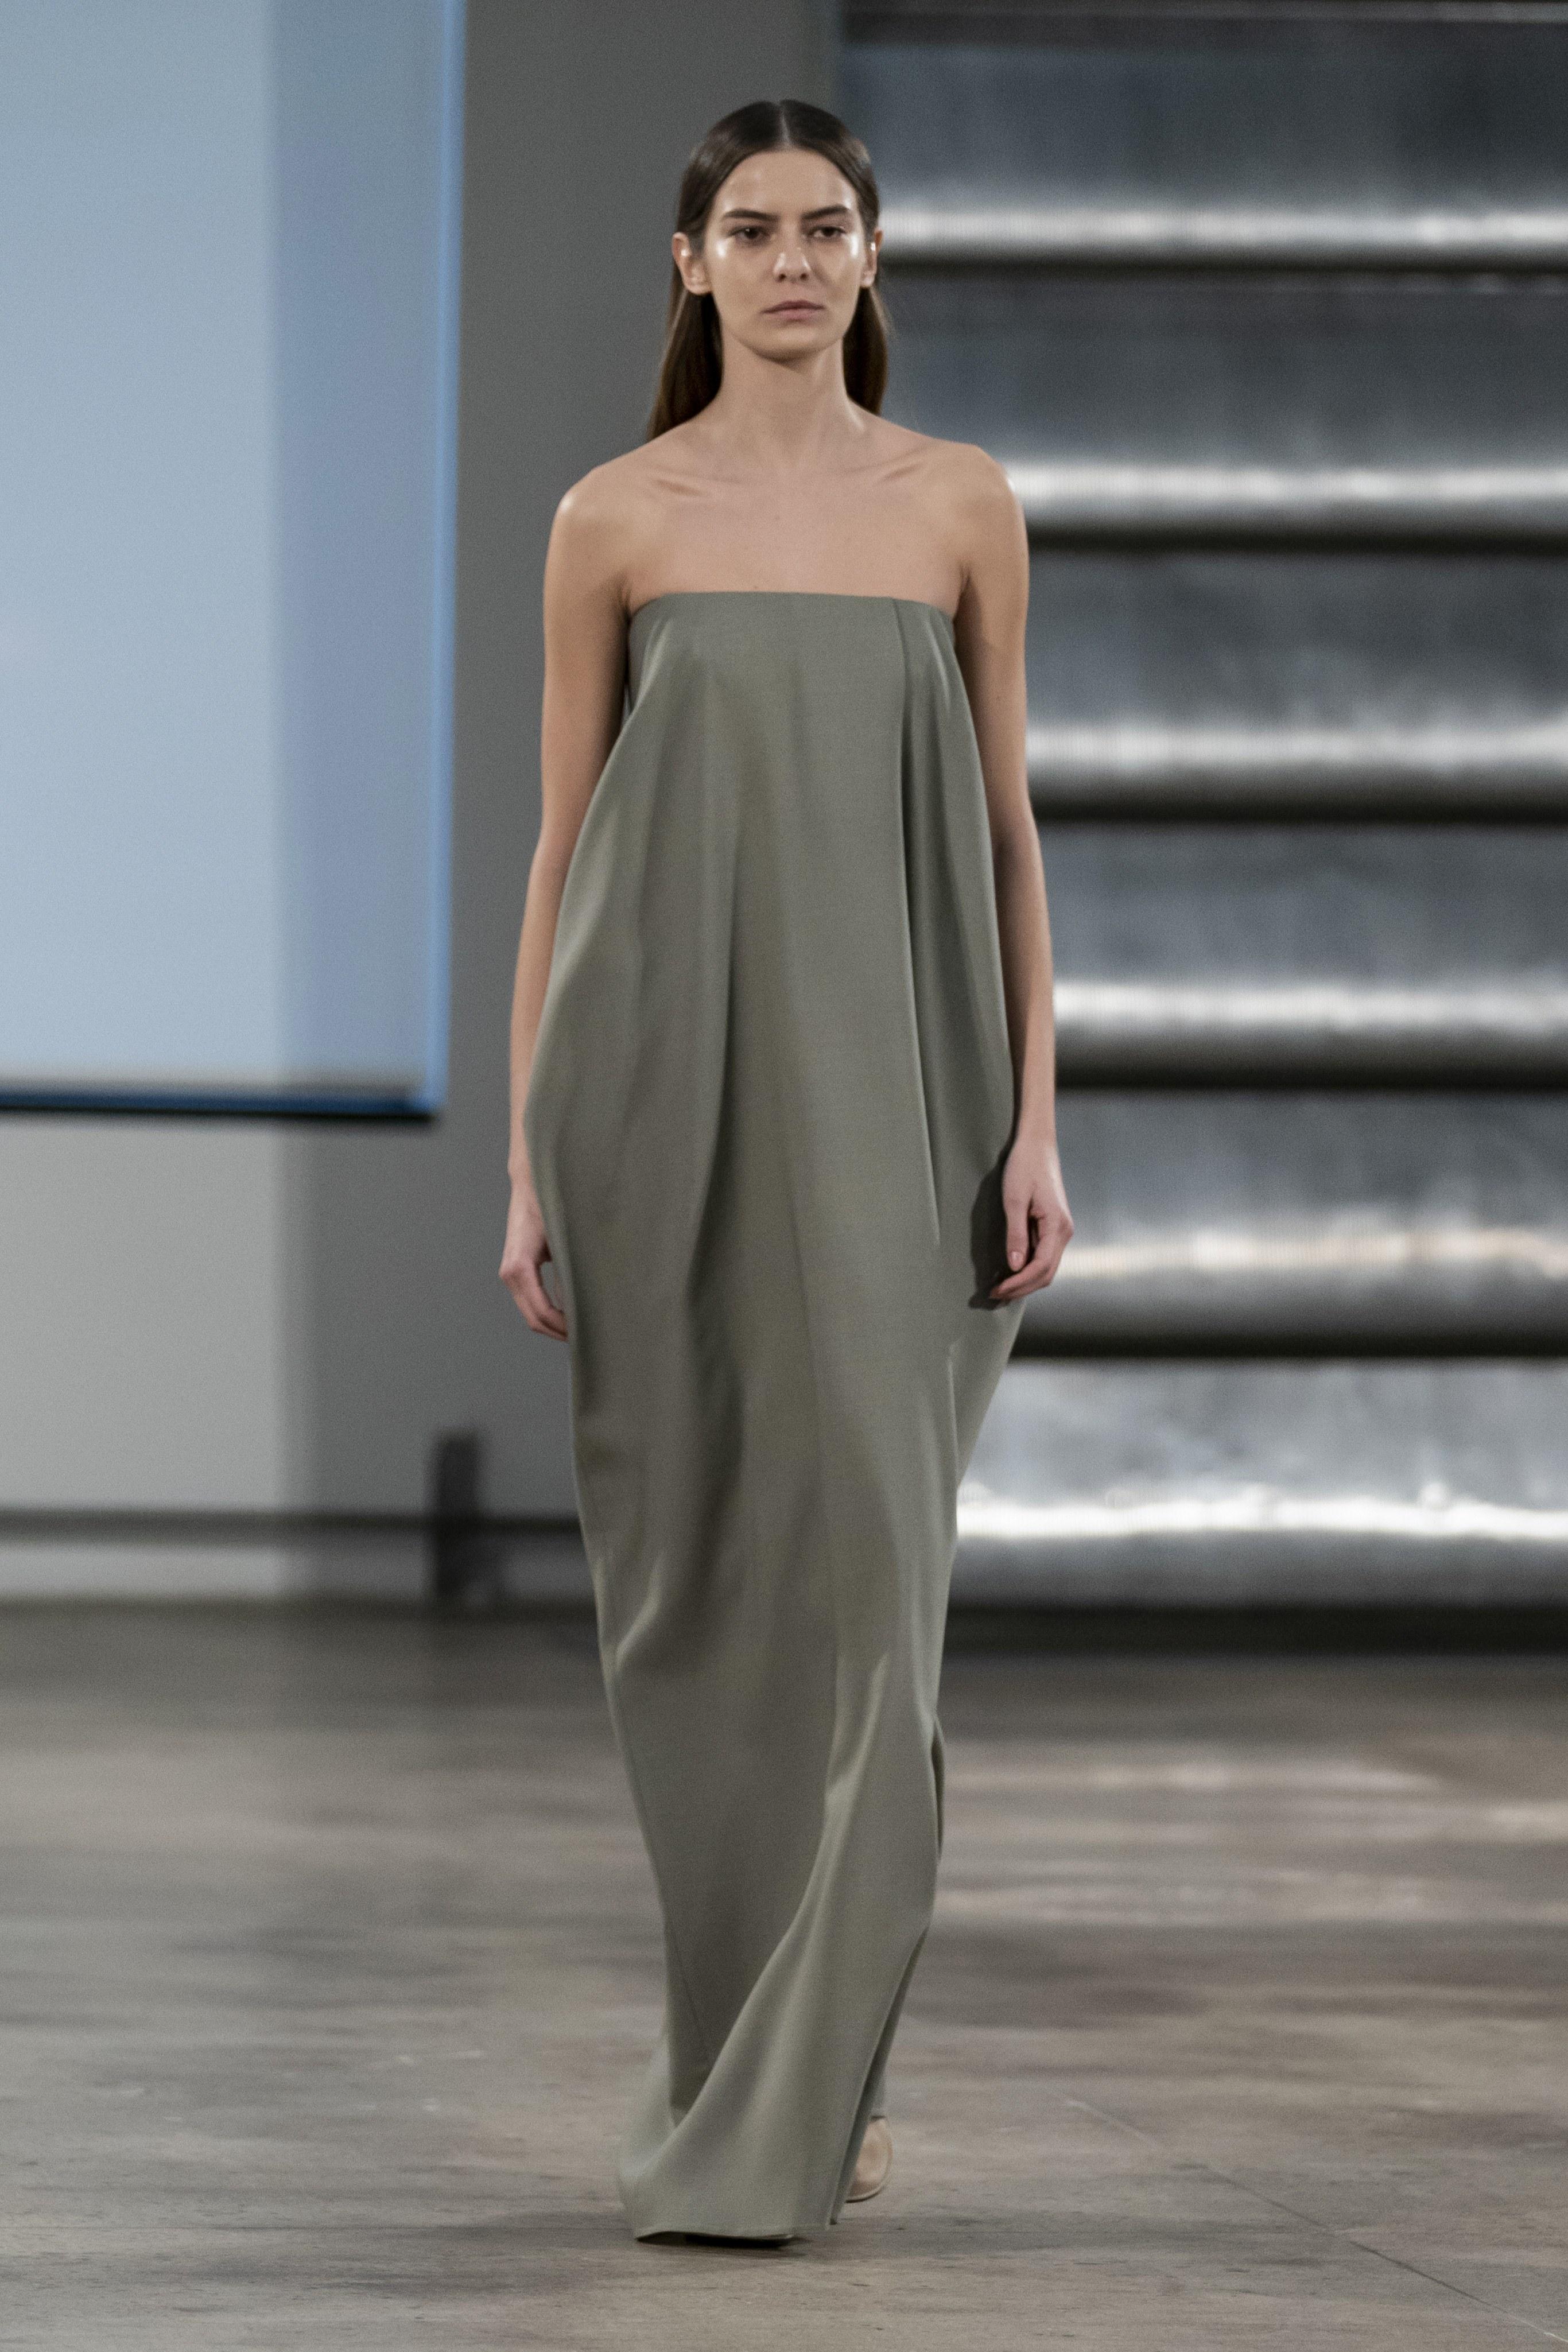 00034-The-Row-Fall-2019-ready-to-wear